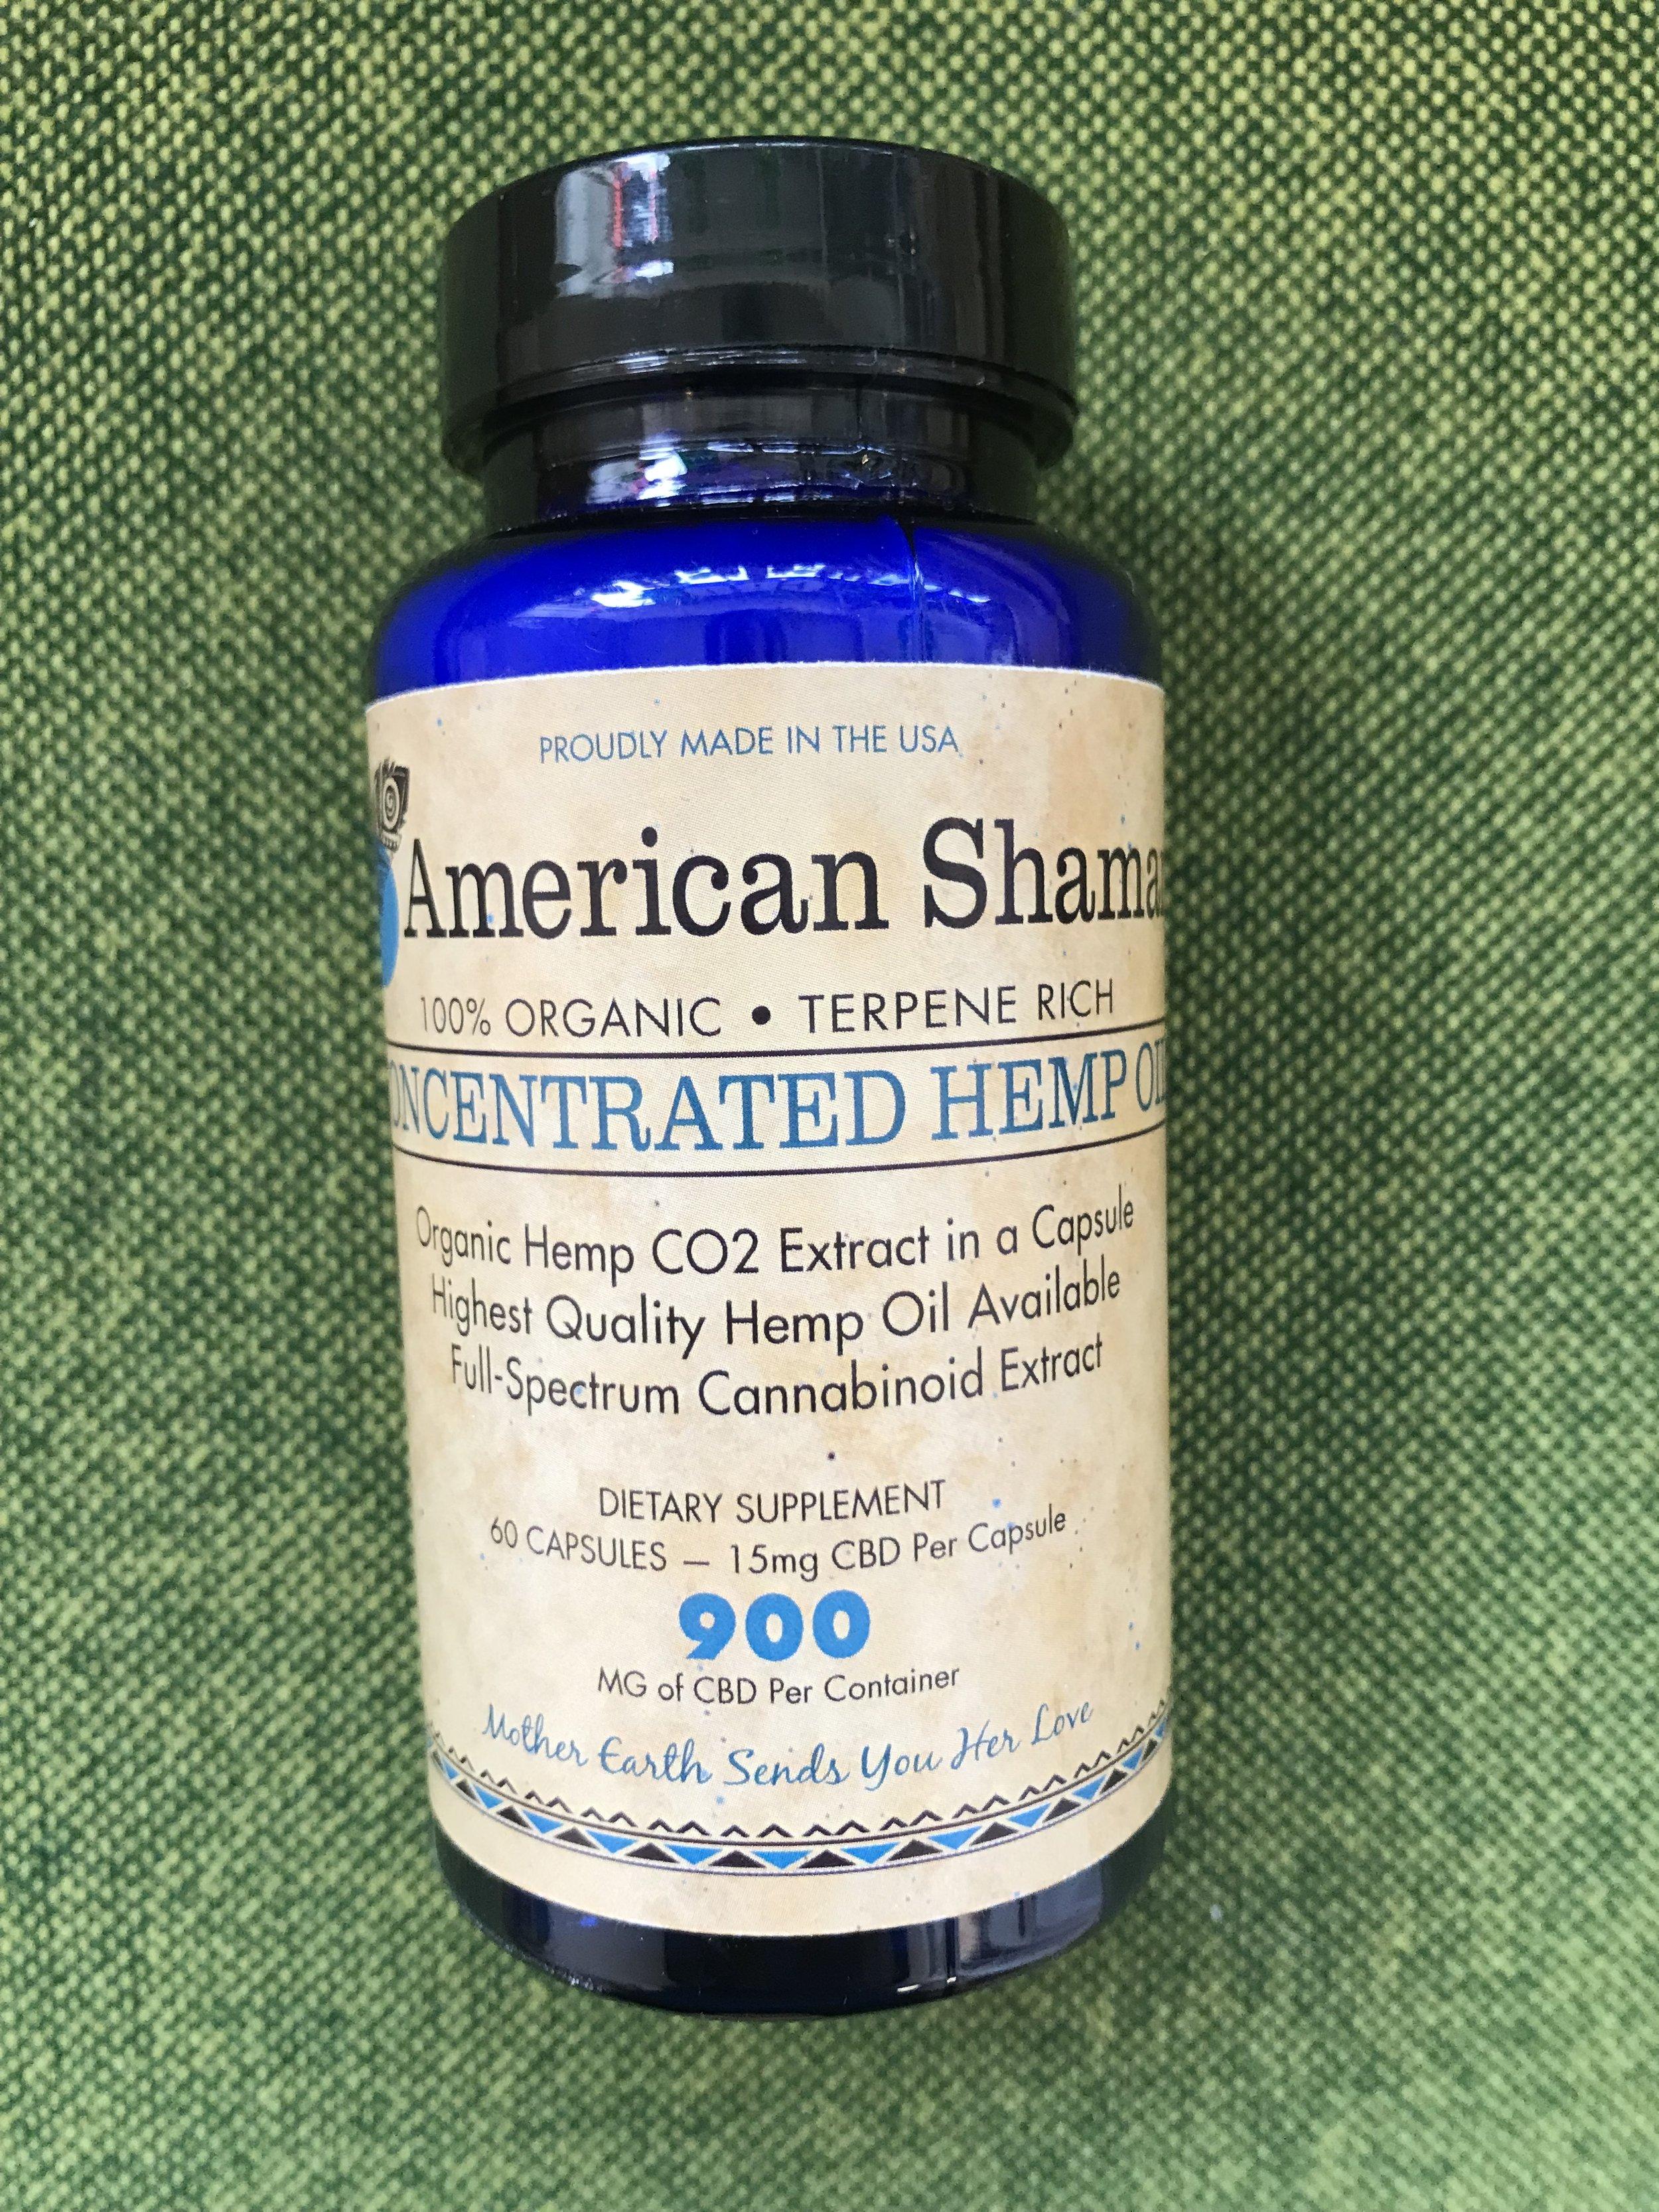 American Shaman Capsules 15mg - $109.99 (60 count)